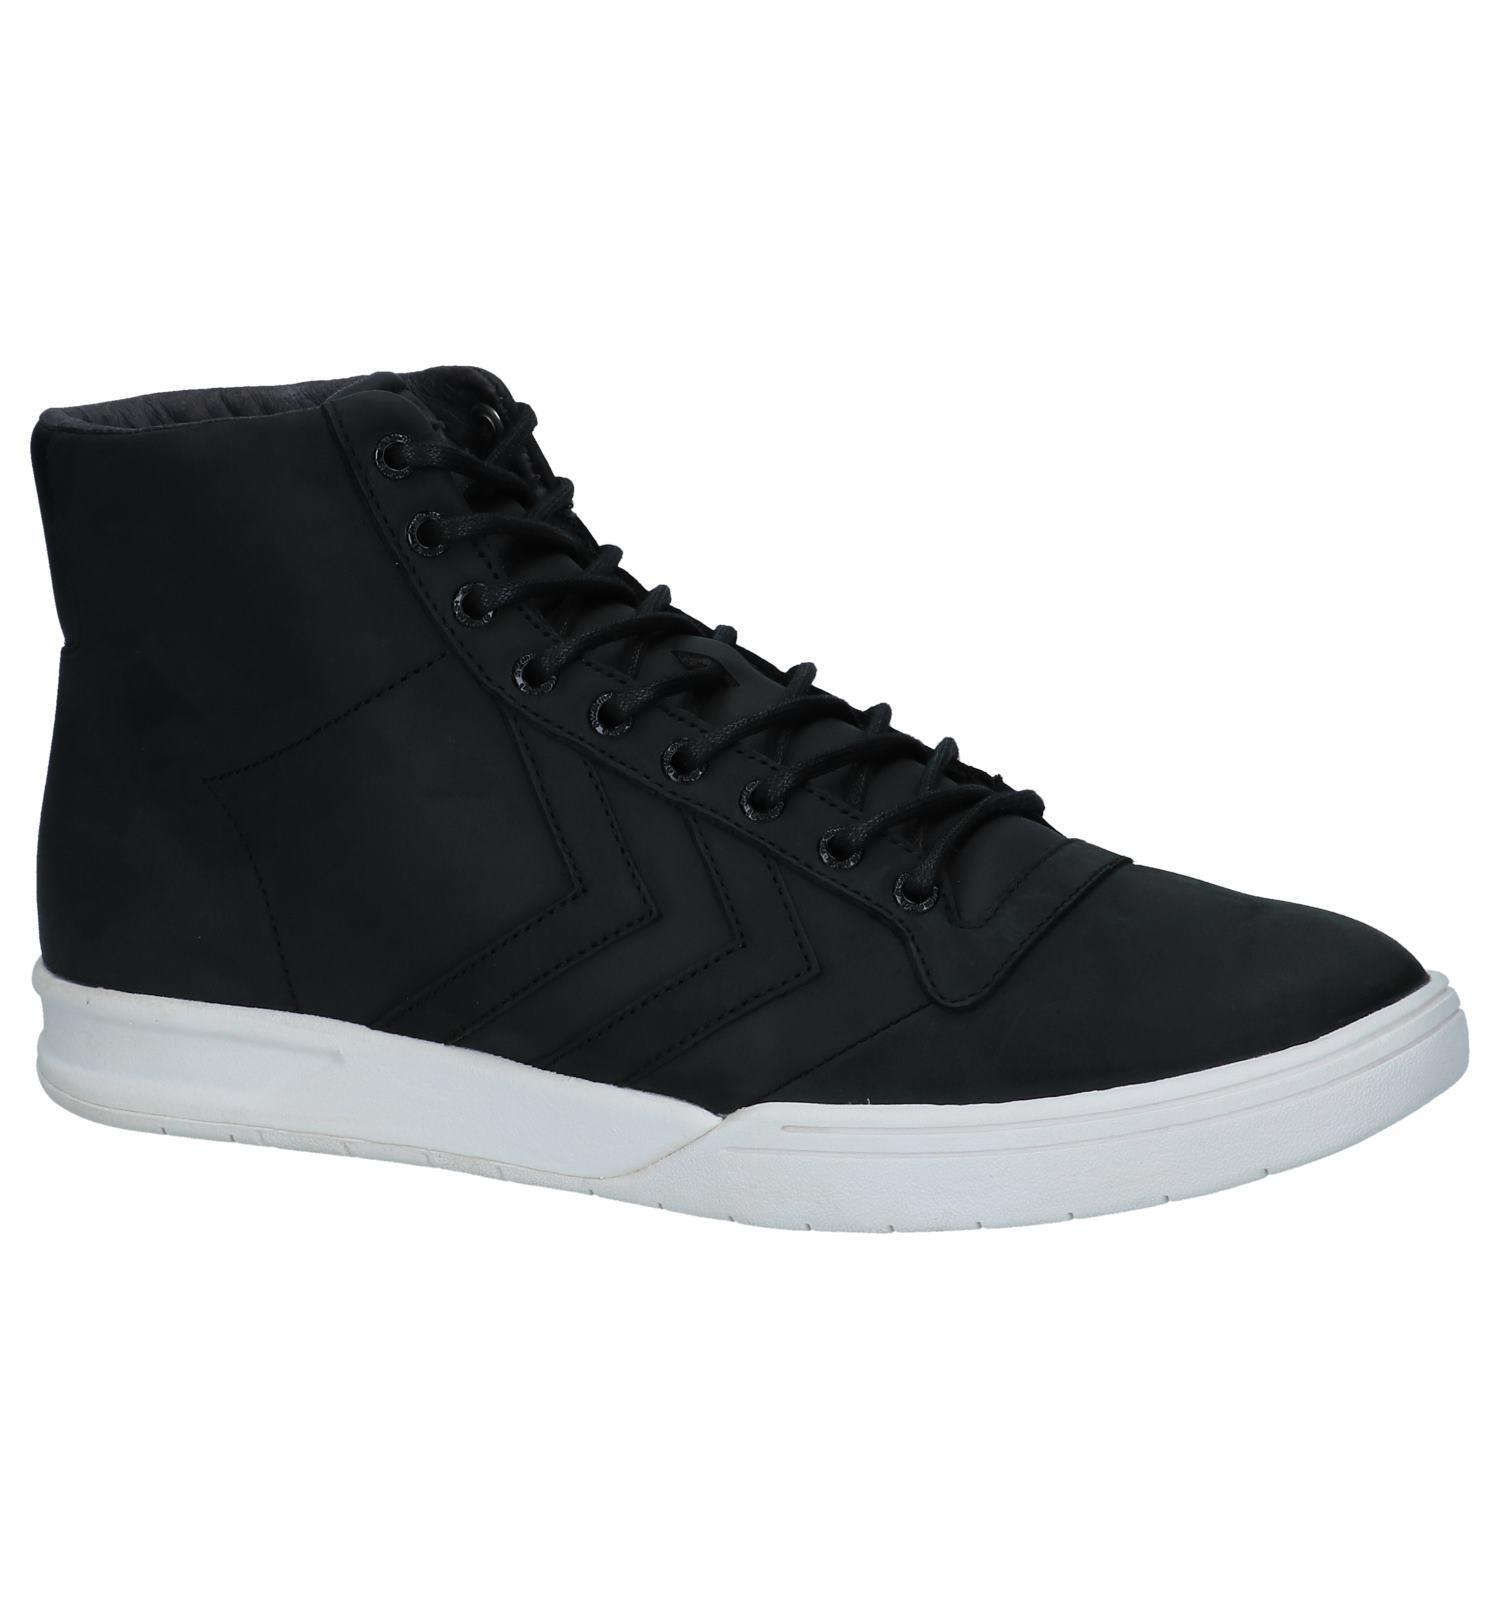 Verzend Hummel nl Hoge Zwarte Schoenentorfs Sneakers En Gratis a6Ynq8w